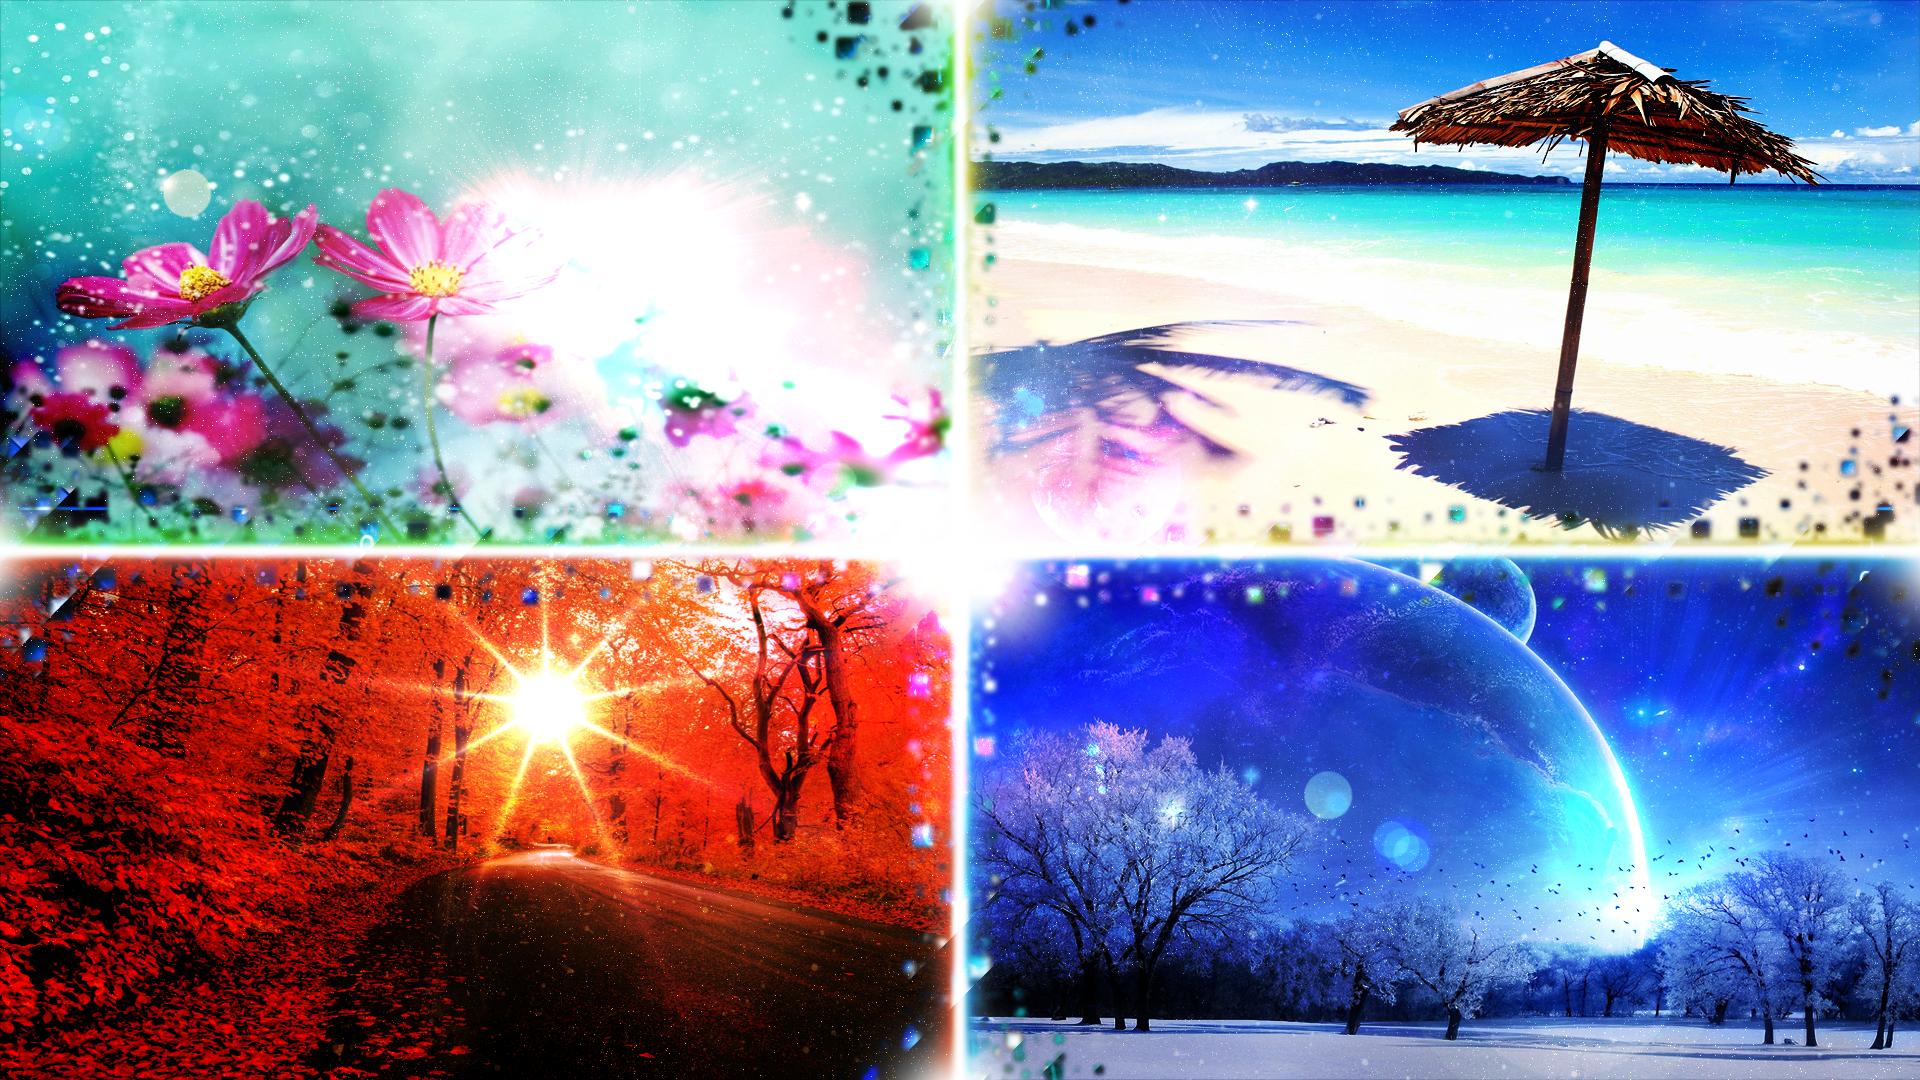 4 seasons wallpaper and edit by hardii on deviantart